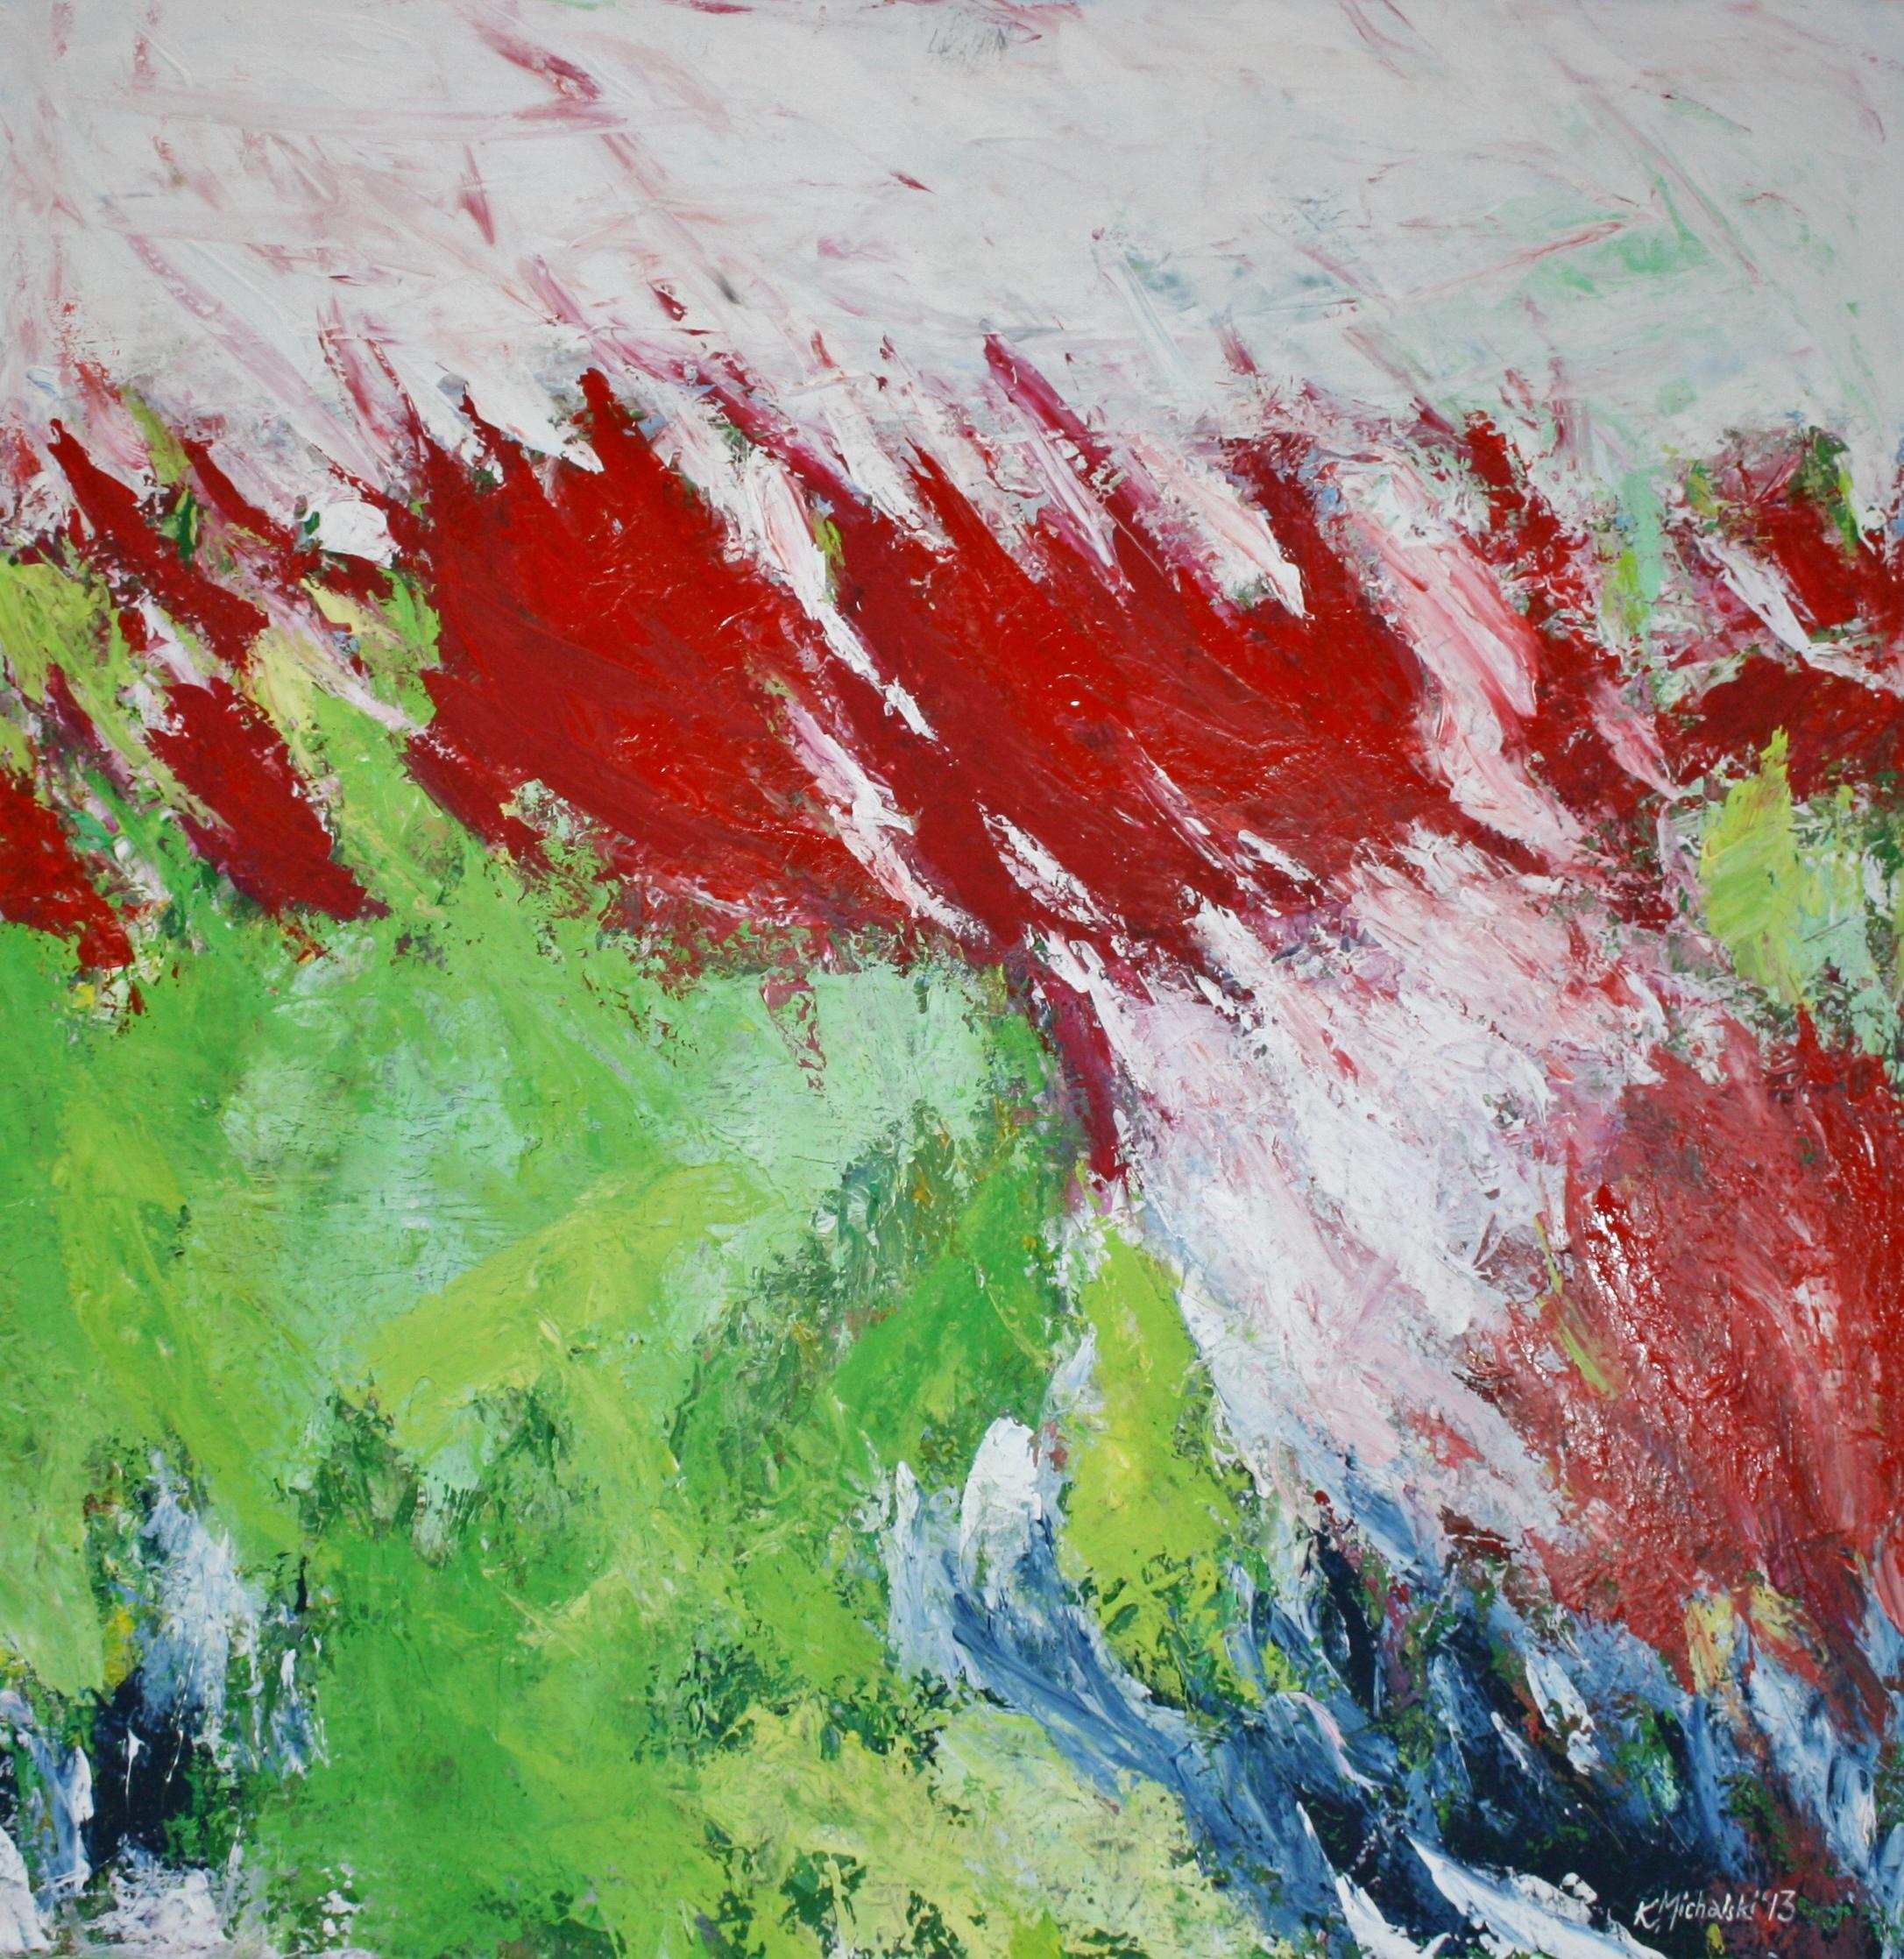 Vier Elemente, 2013, 100 x 100, Acryl auf Leinwand